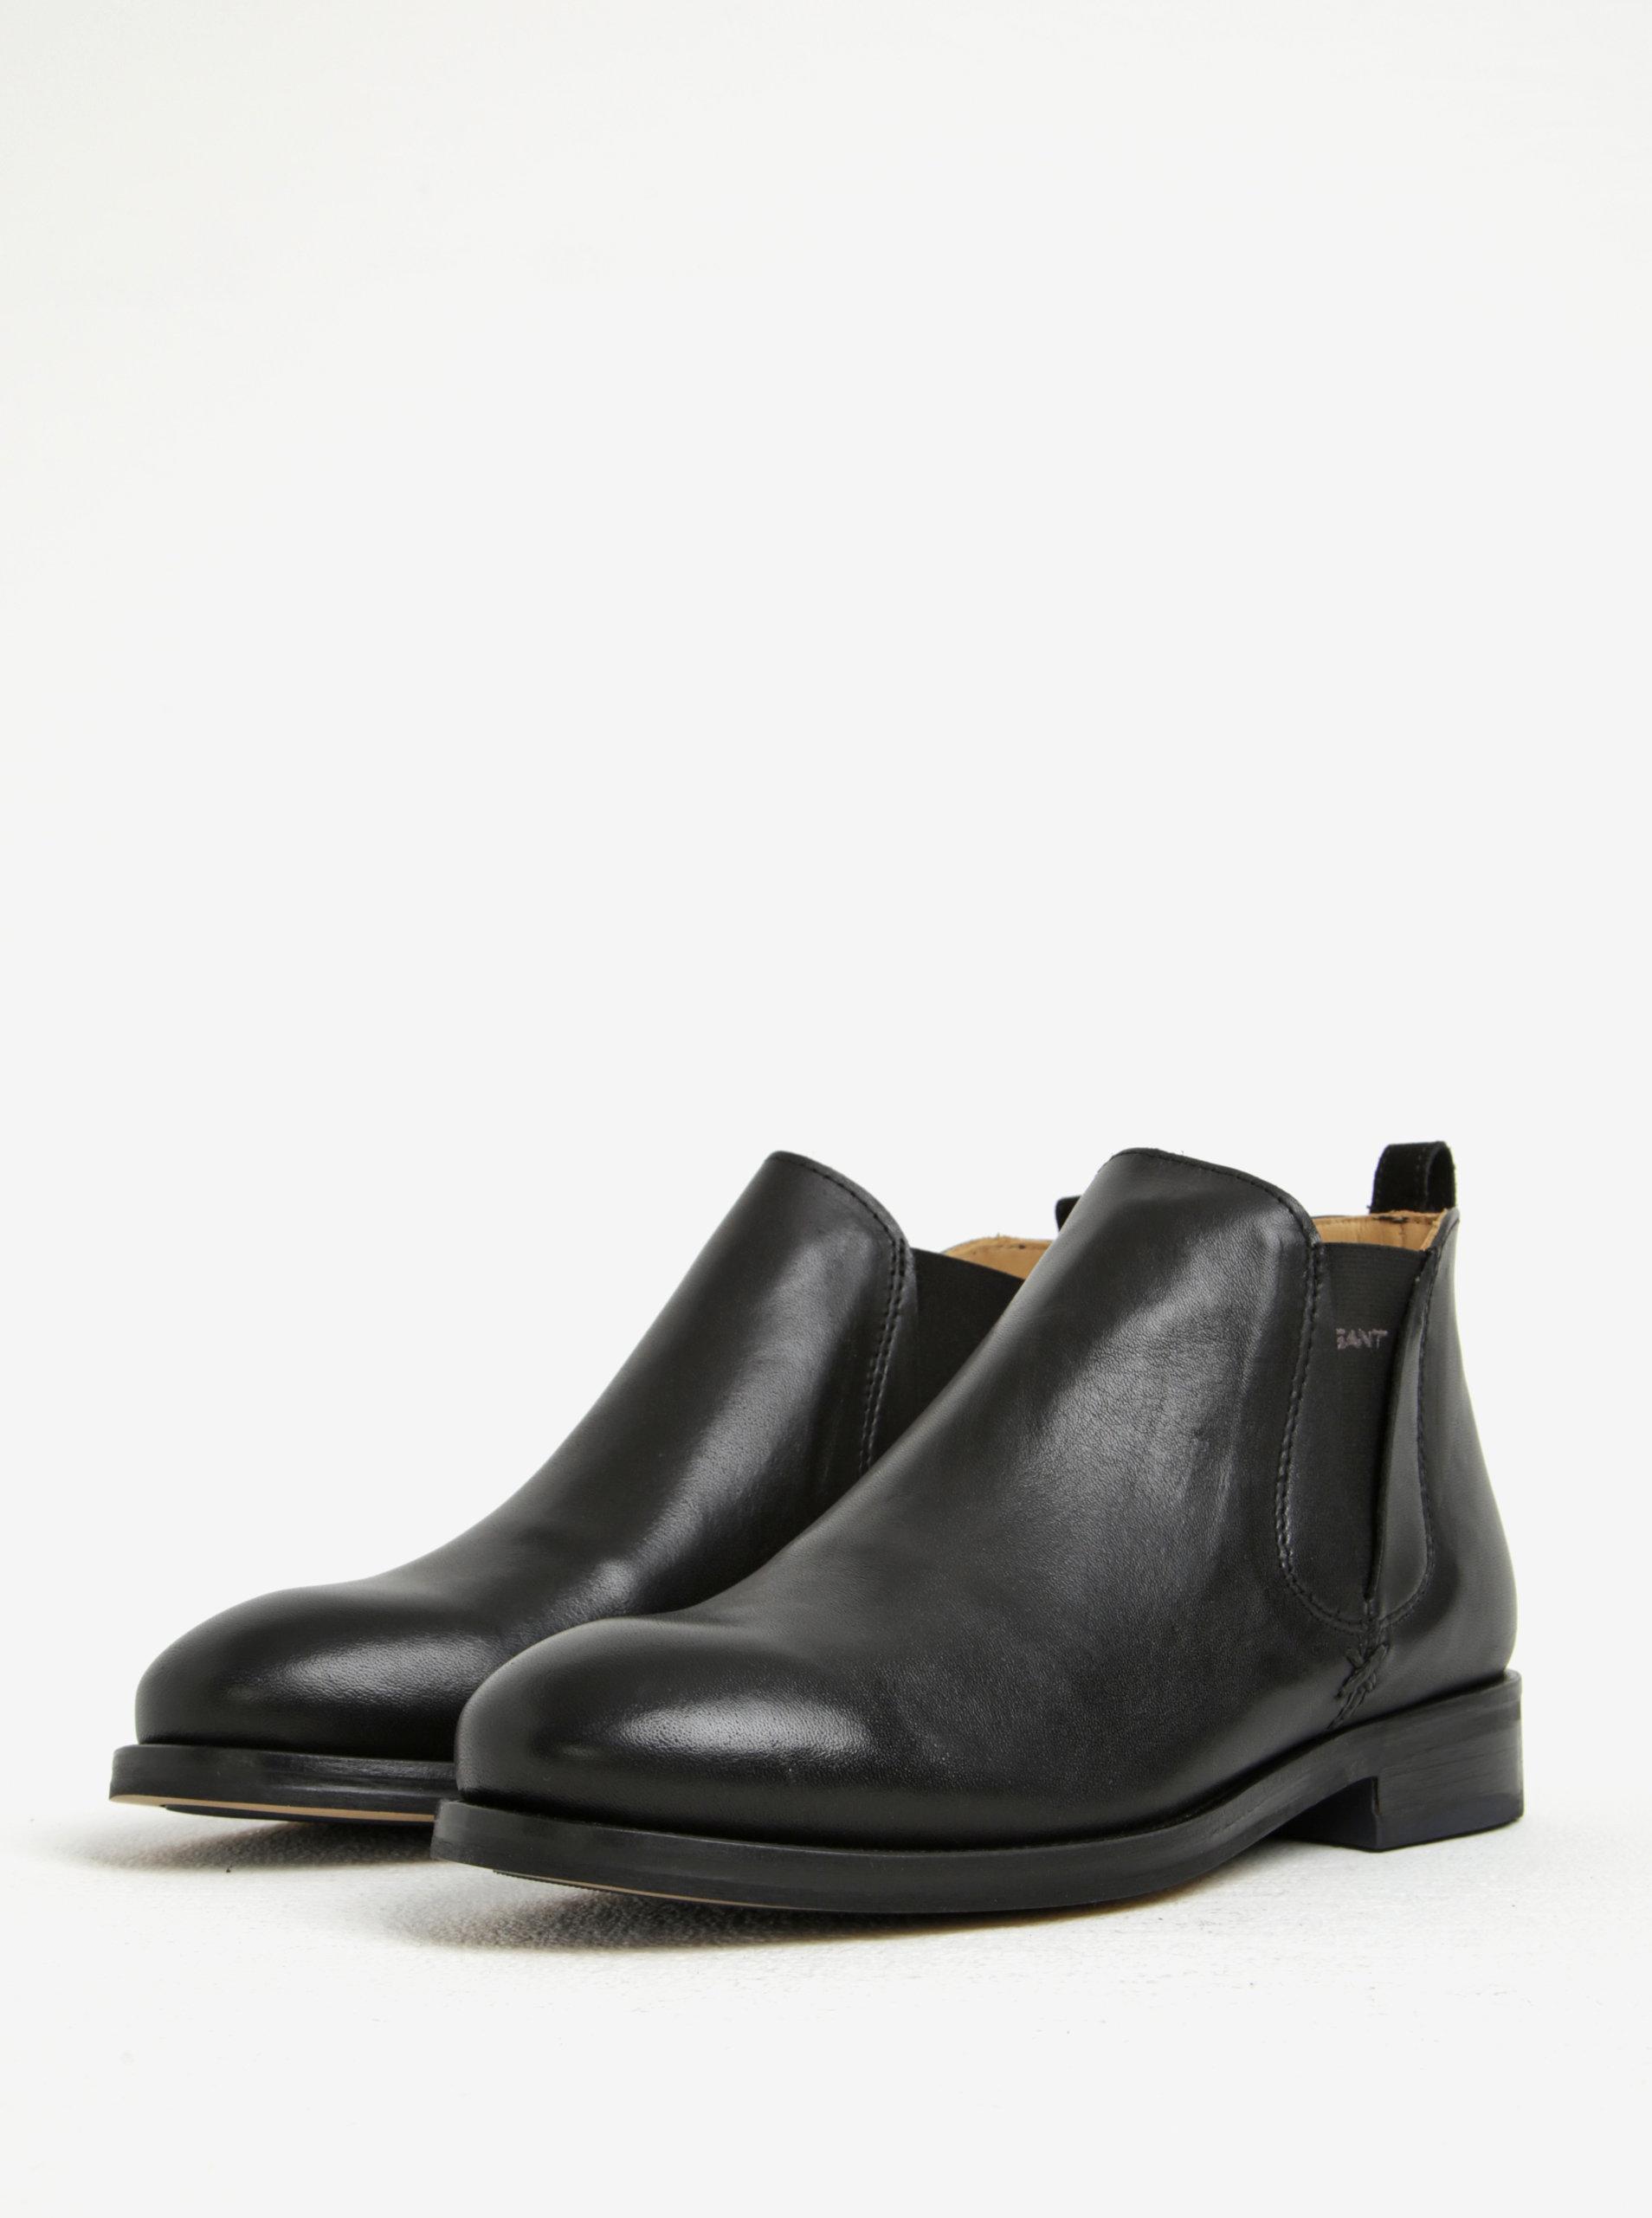 Čierne dámske kožené chelsea topánky GANT Avery ... 0562f5e75a1